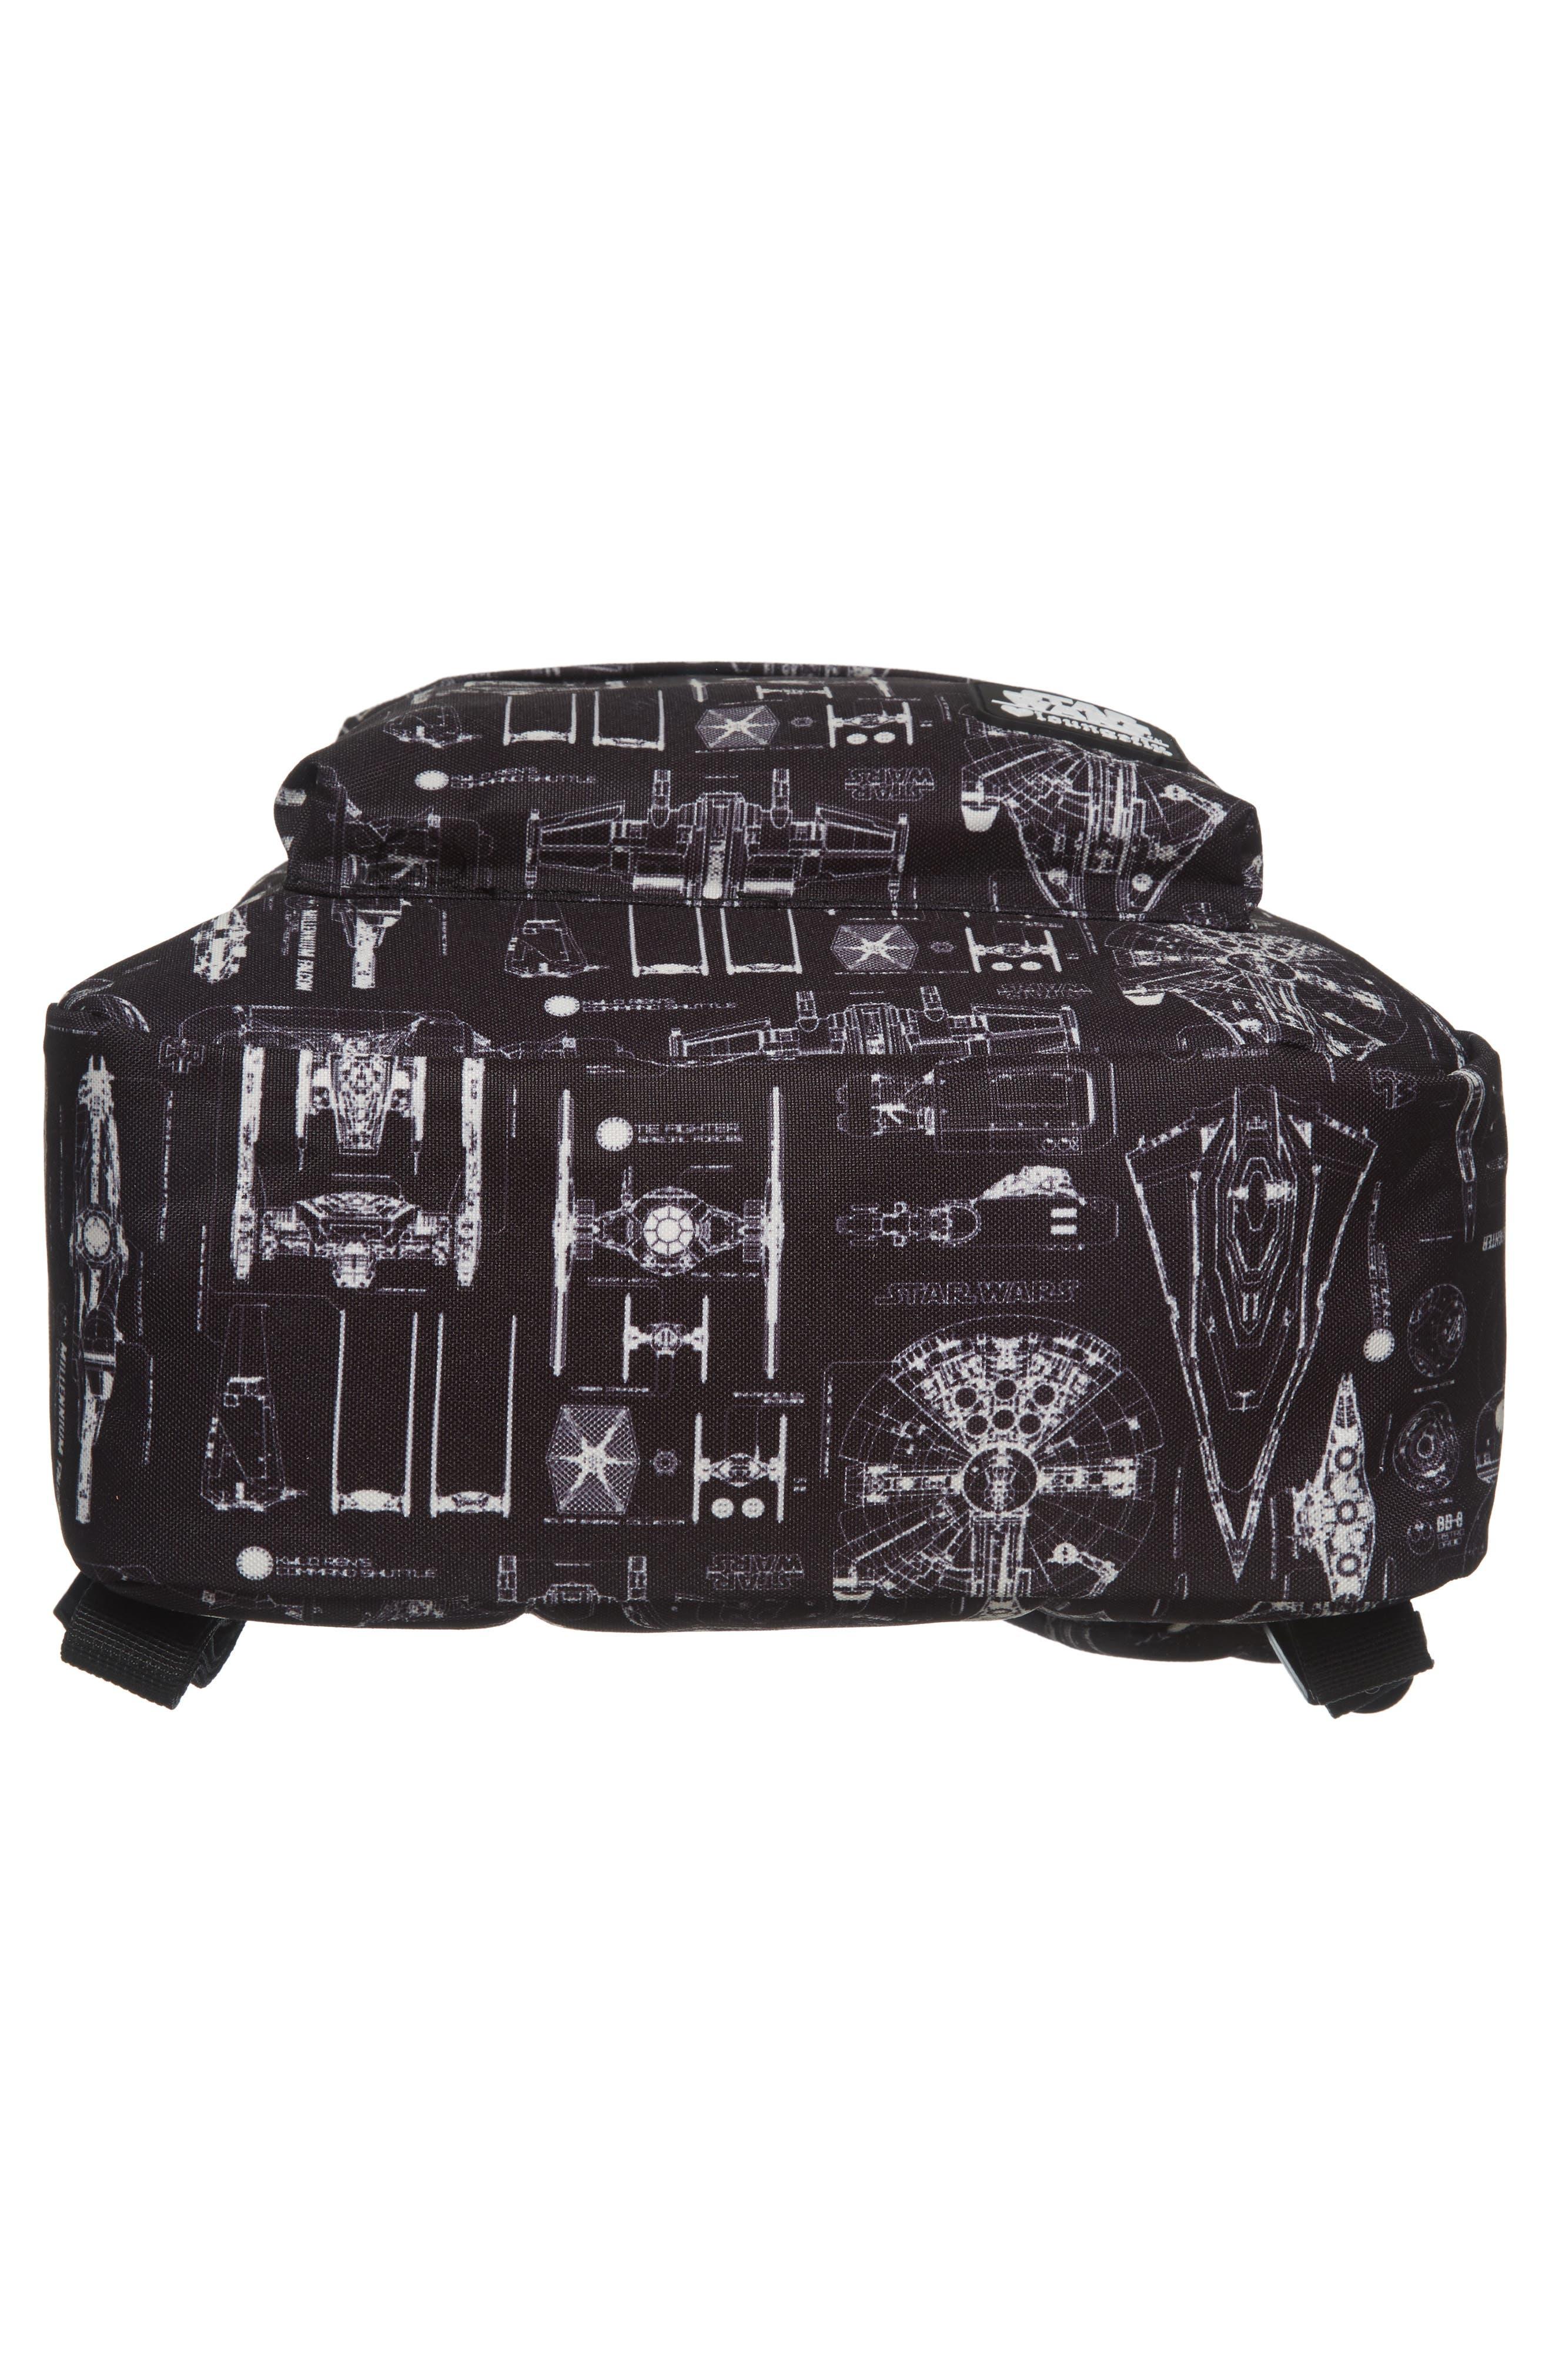 Star Wars<sup>™</sup> The Force Awakens Blueprint Backpack,                             Alternate thumbnail 5, color,                             Black